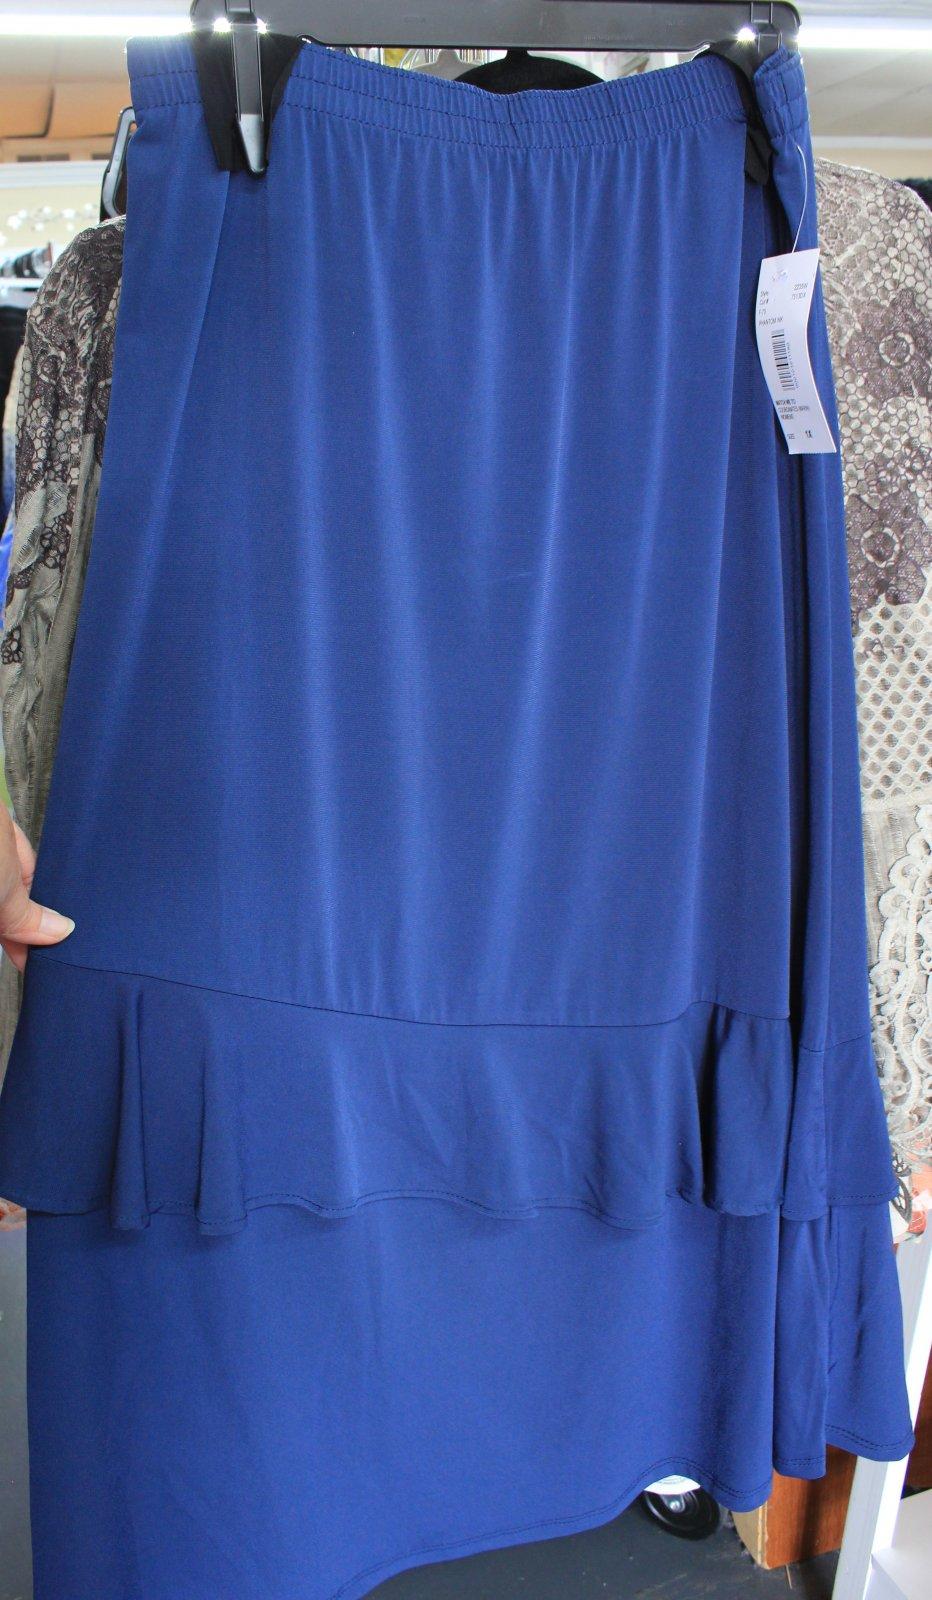 Southern Lady Plus Teal skirt w/ruffle